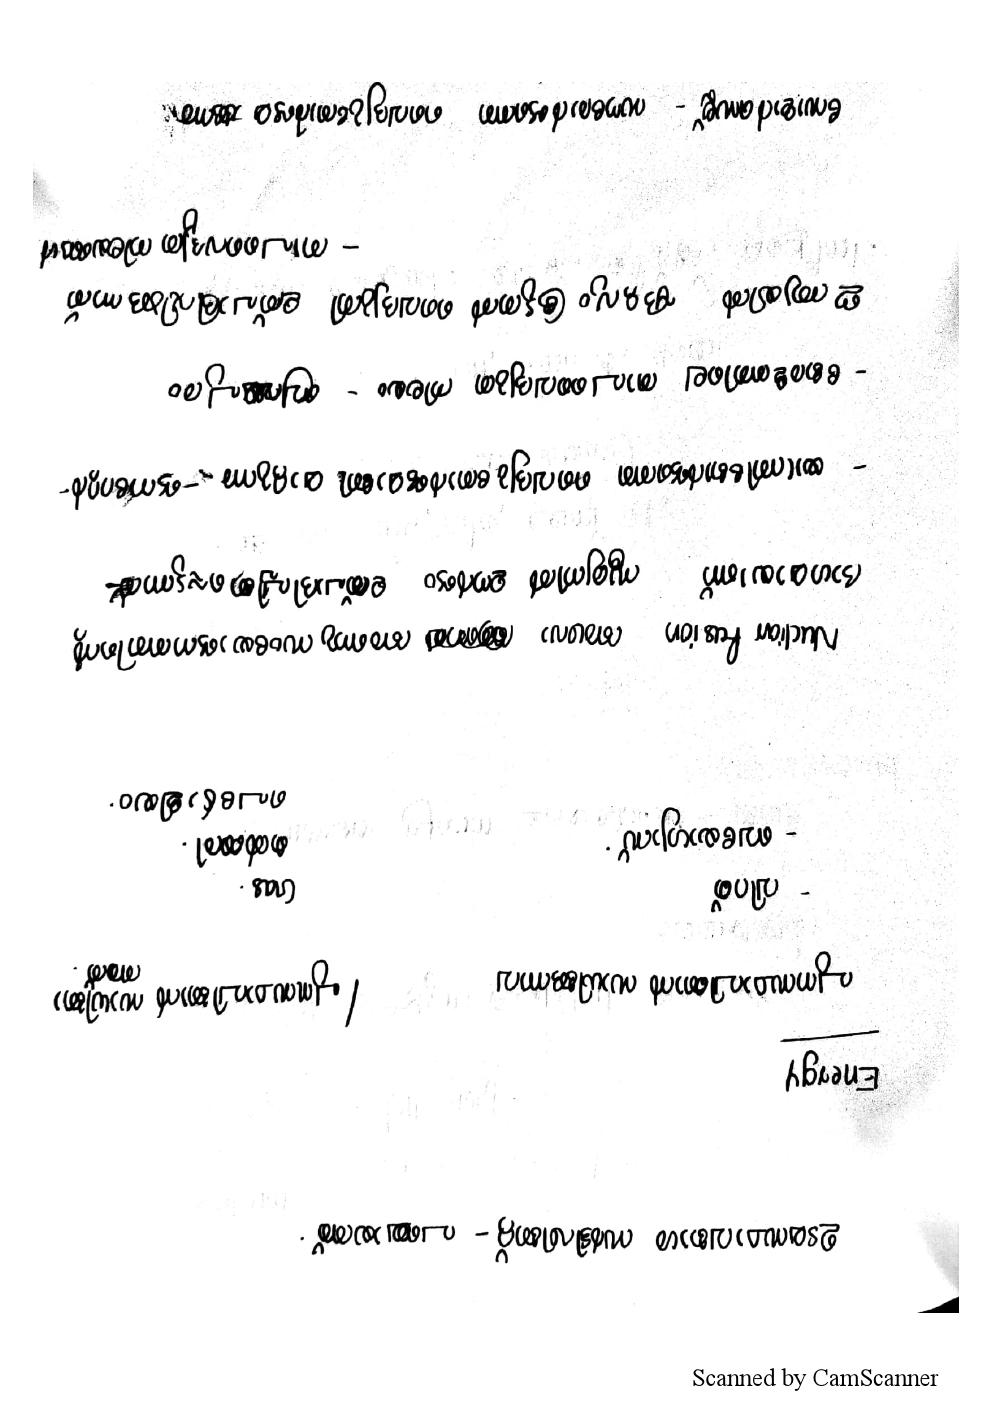 http://masterstudy.net/pdf/ktet_notes0040.png